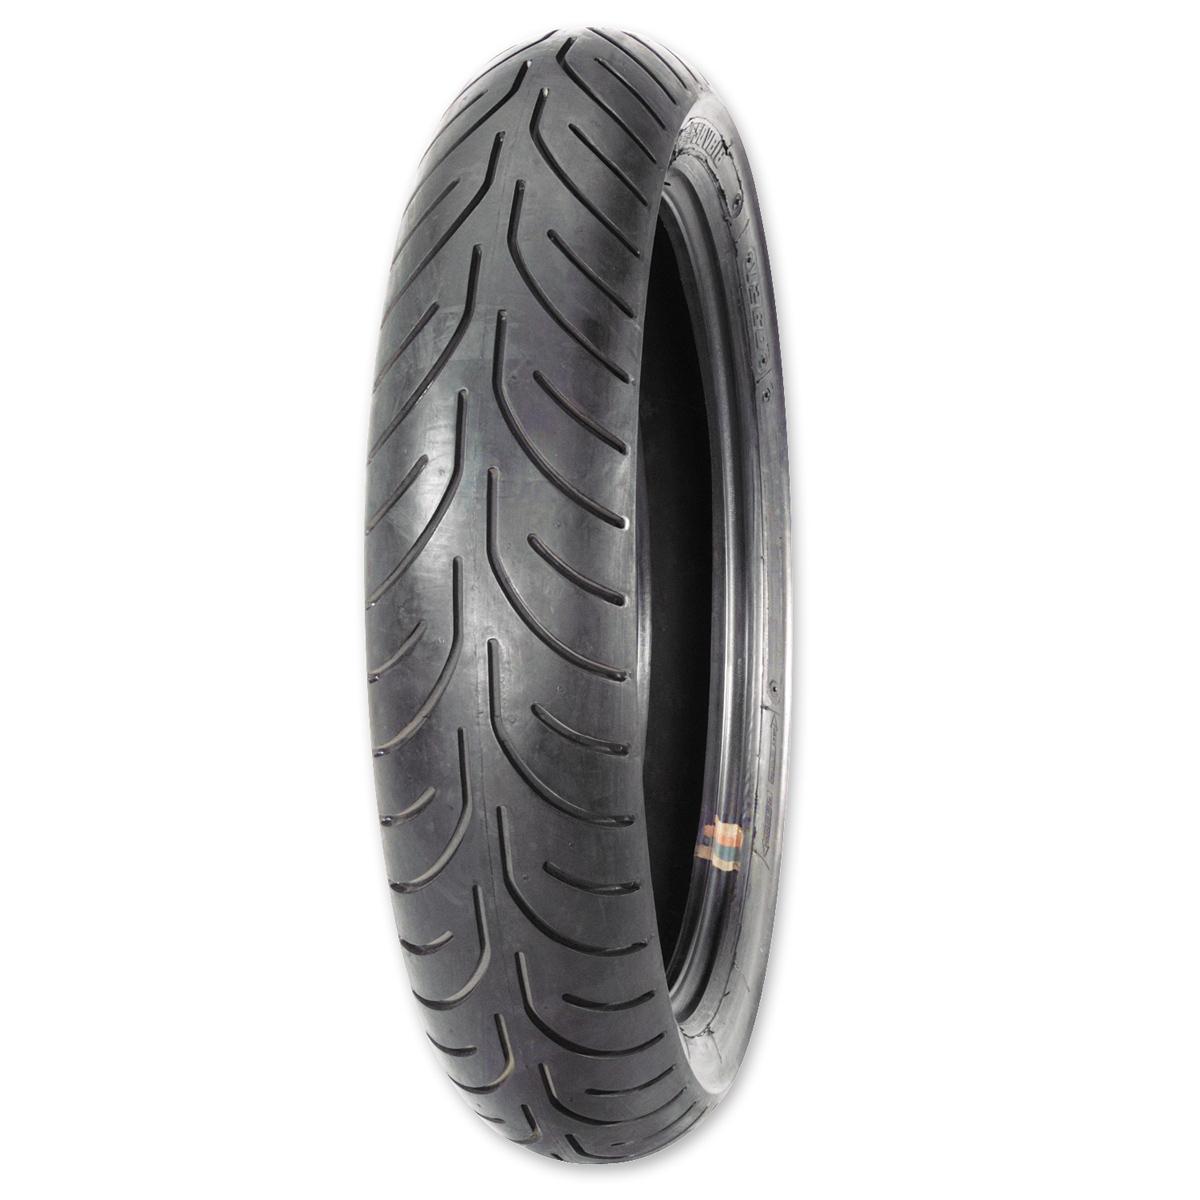 Avon AM22 120/70VB17 Front Tire